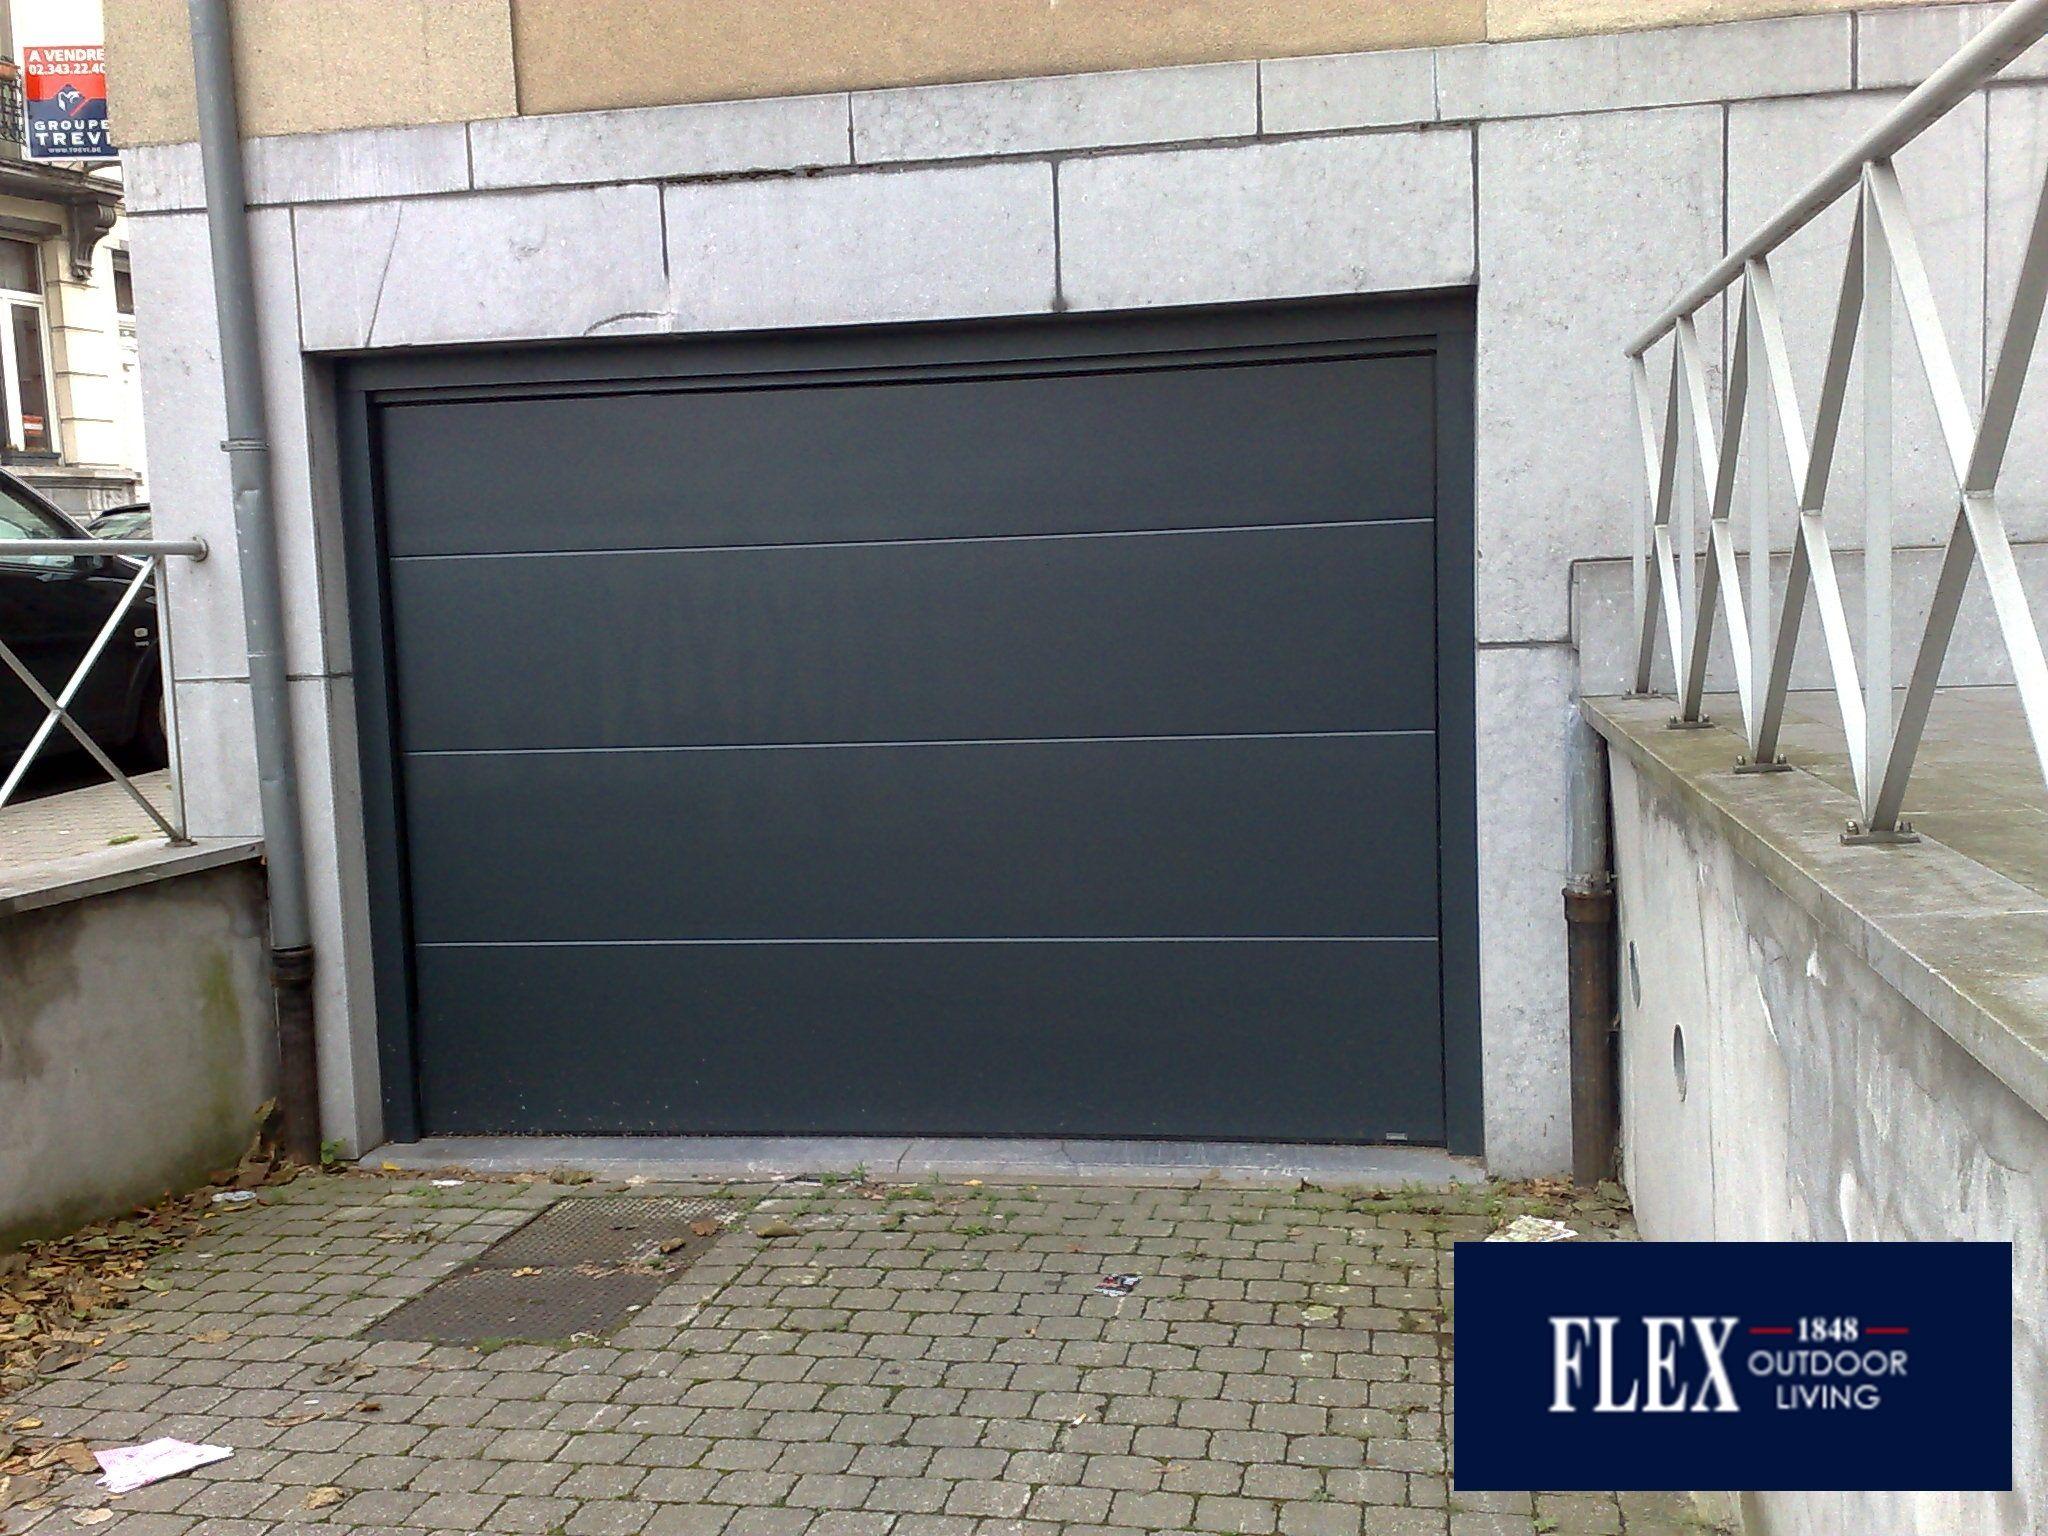 Porte De Garage Sectionnelle Flex 1848 Porte Garage Porte